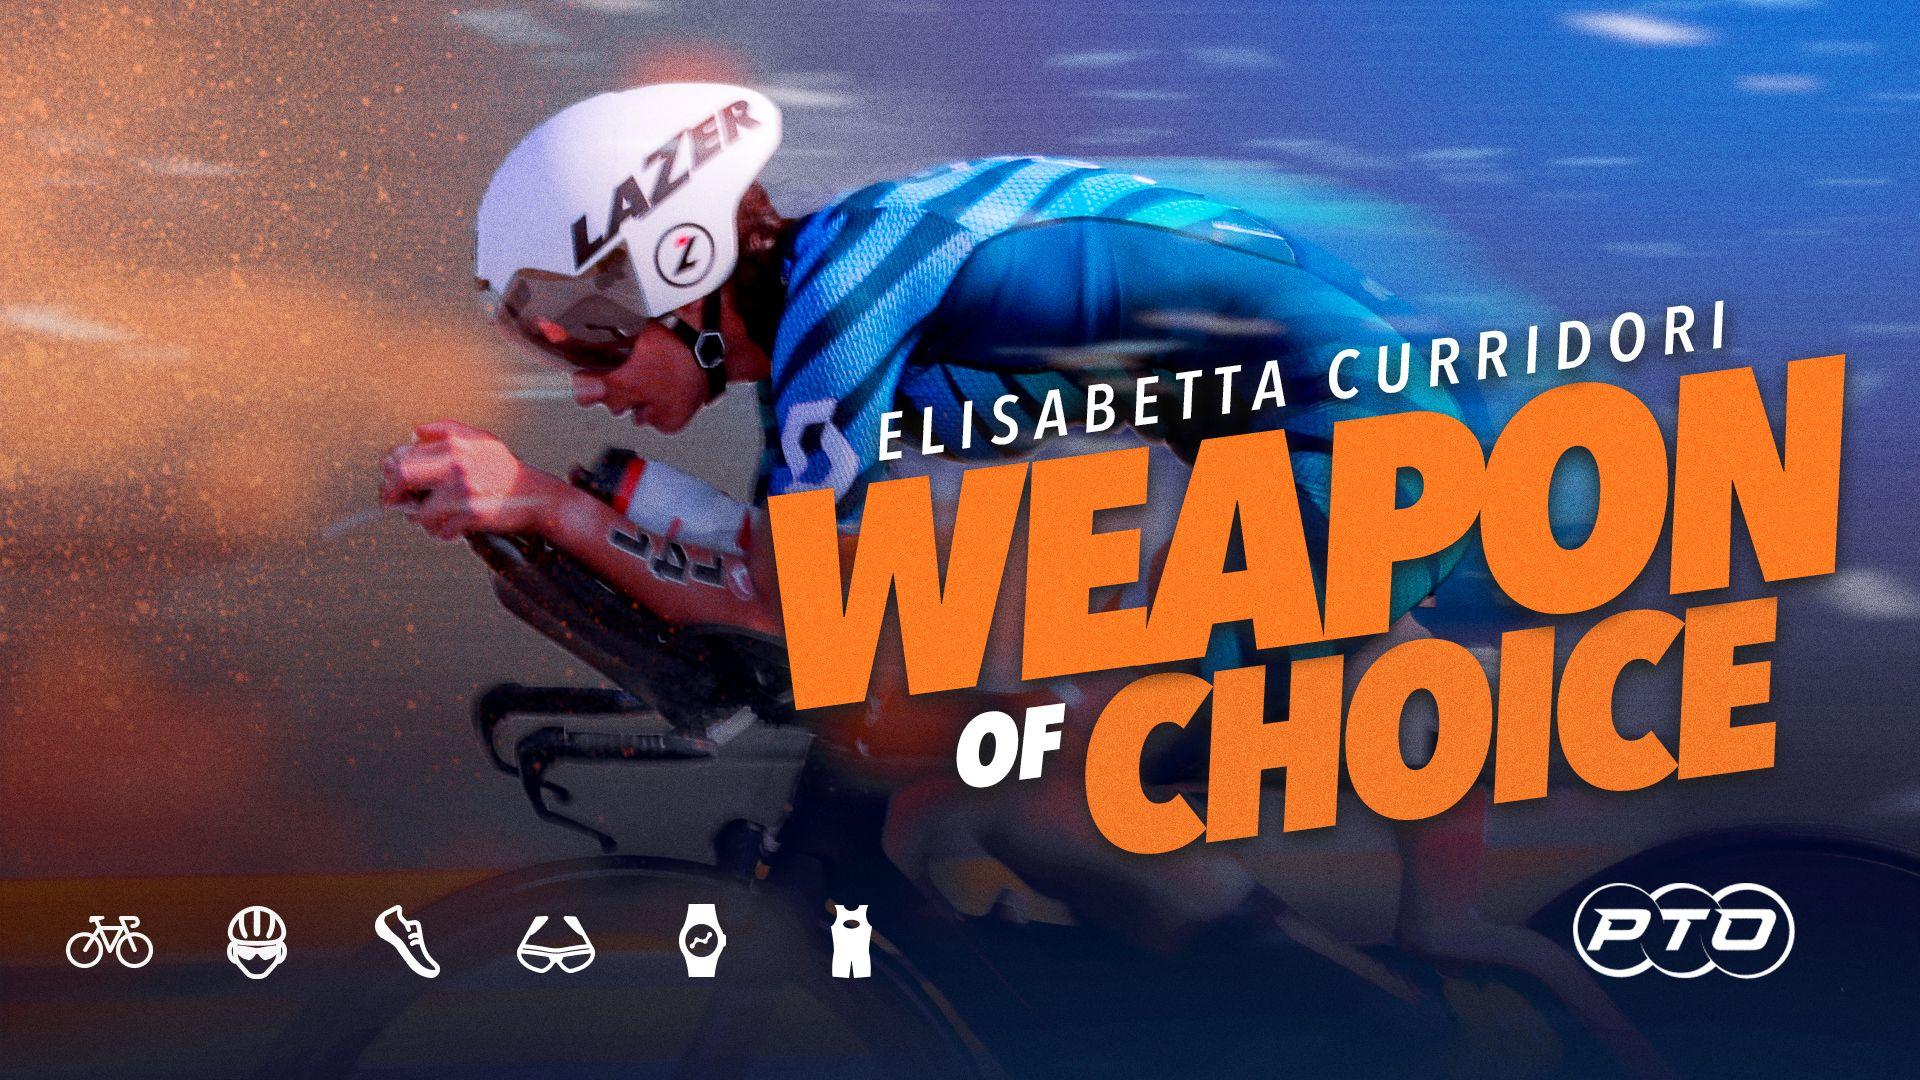 Weapon of Choice || Elisabetta Curridori